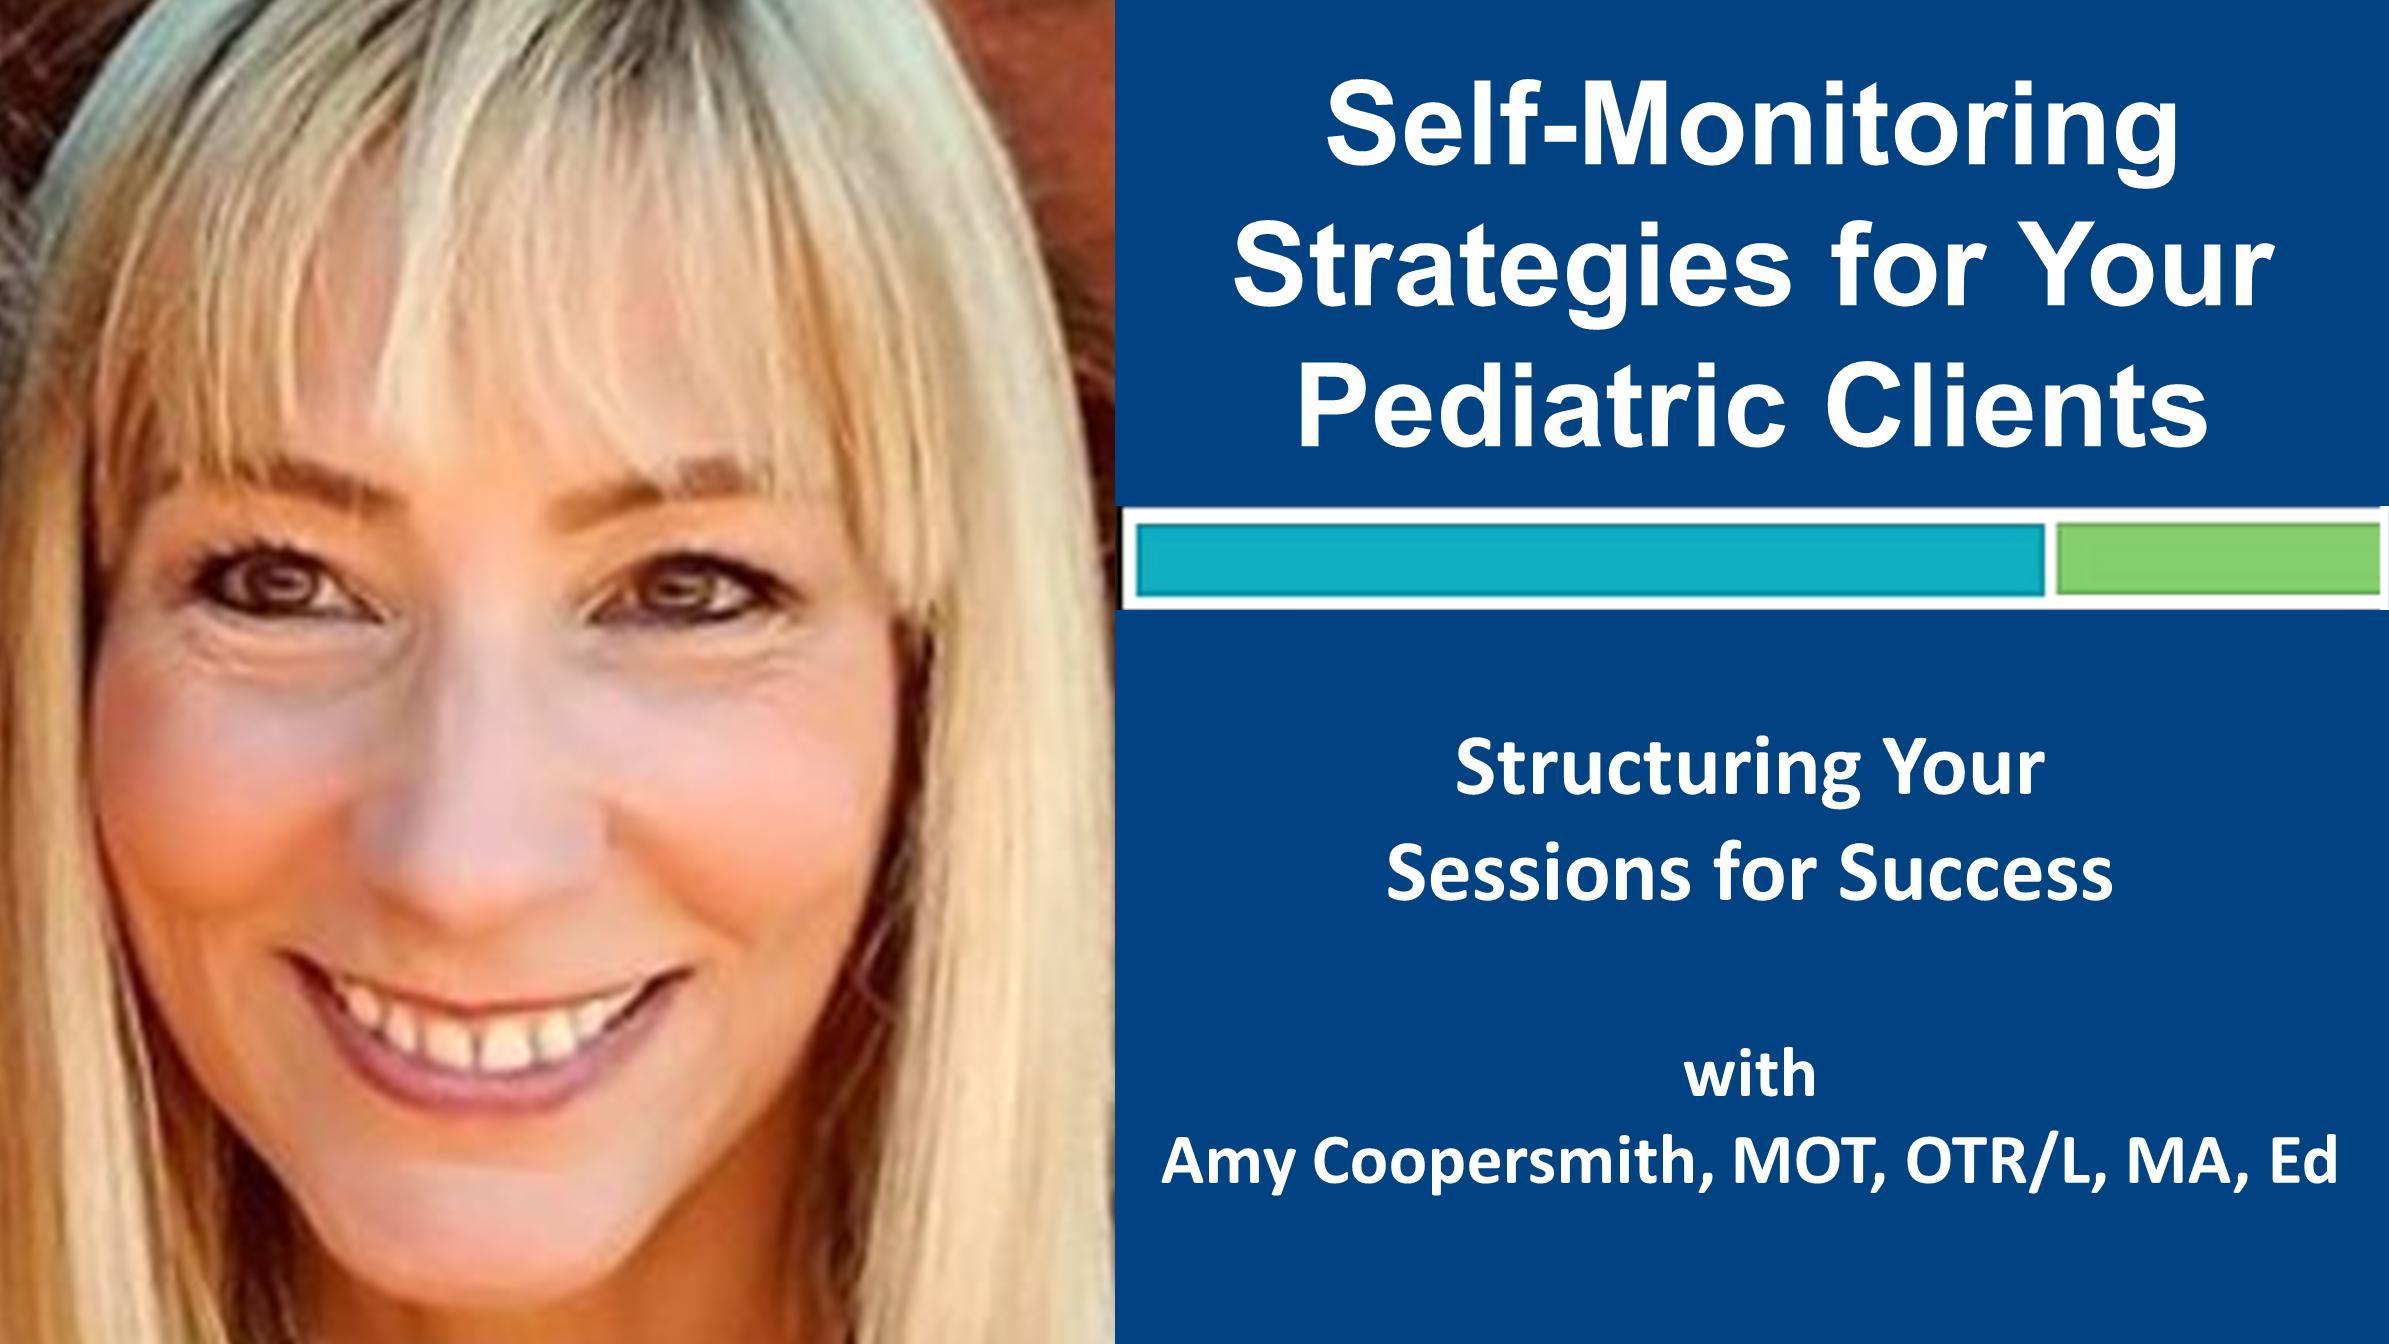 Webinar 4: Self-Monitoring Strategies with Amy Coopersmith, MOT, OTR/L, MA, Ed